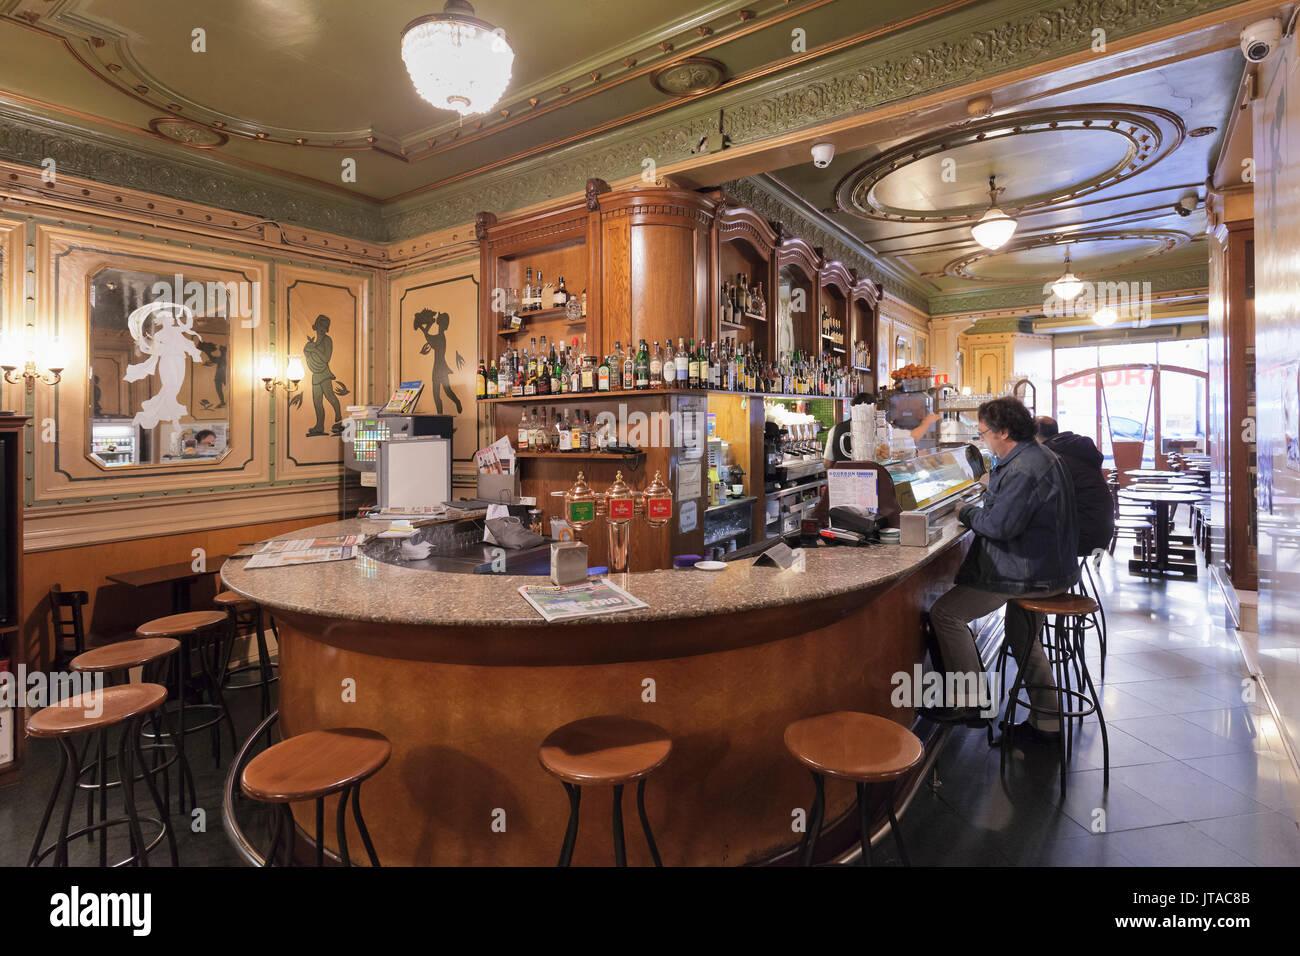 Art Nouveau Cafe de l'Opera, La Rambla (Les Ramblas), Barcelona, Catalonia, Spain, Europe - Stock Image